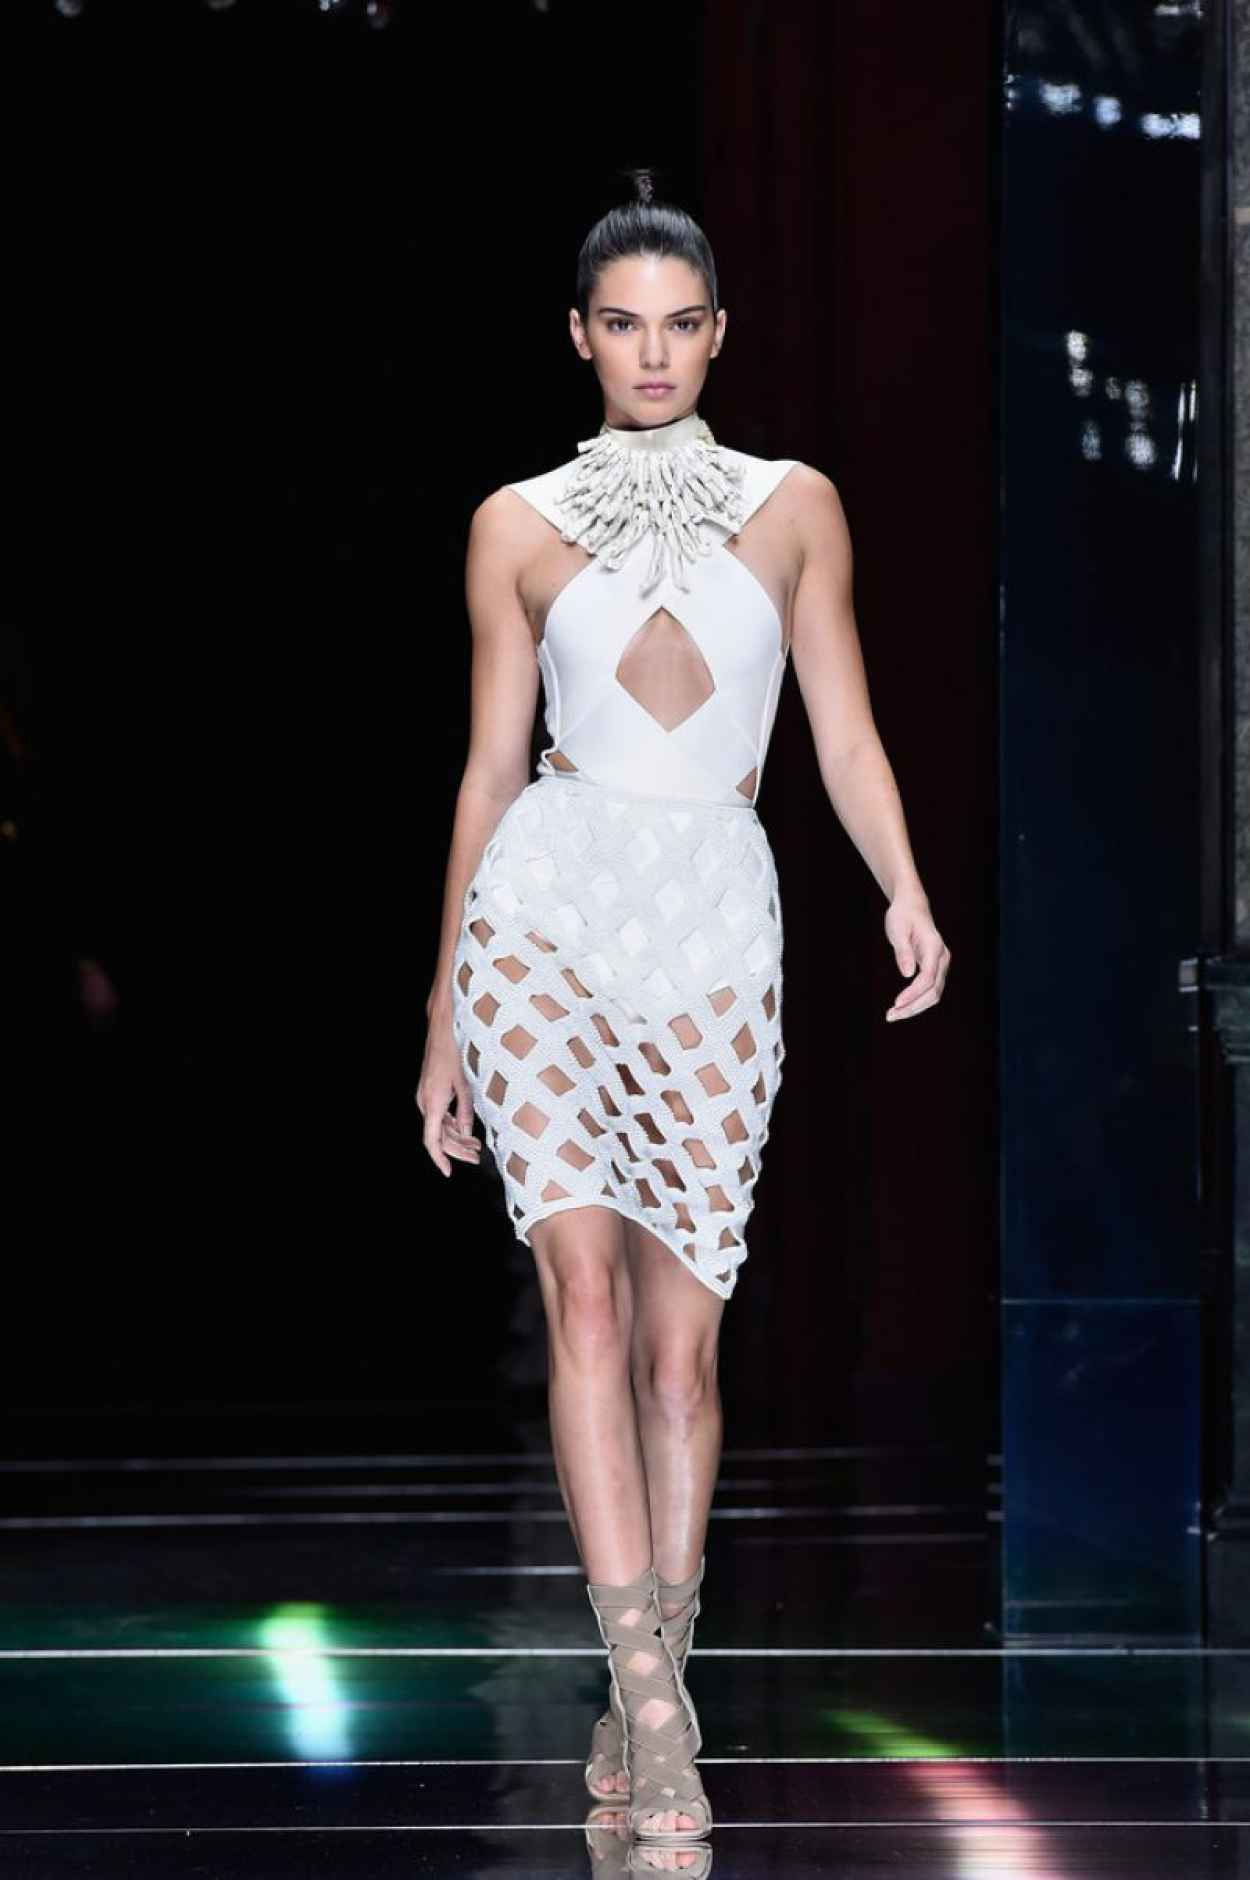 Kendall Jenner Balmain Show At Paris Fashion Week Womenswear S S 2016